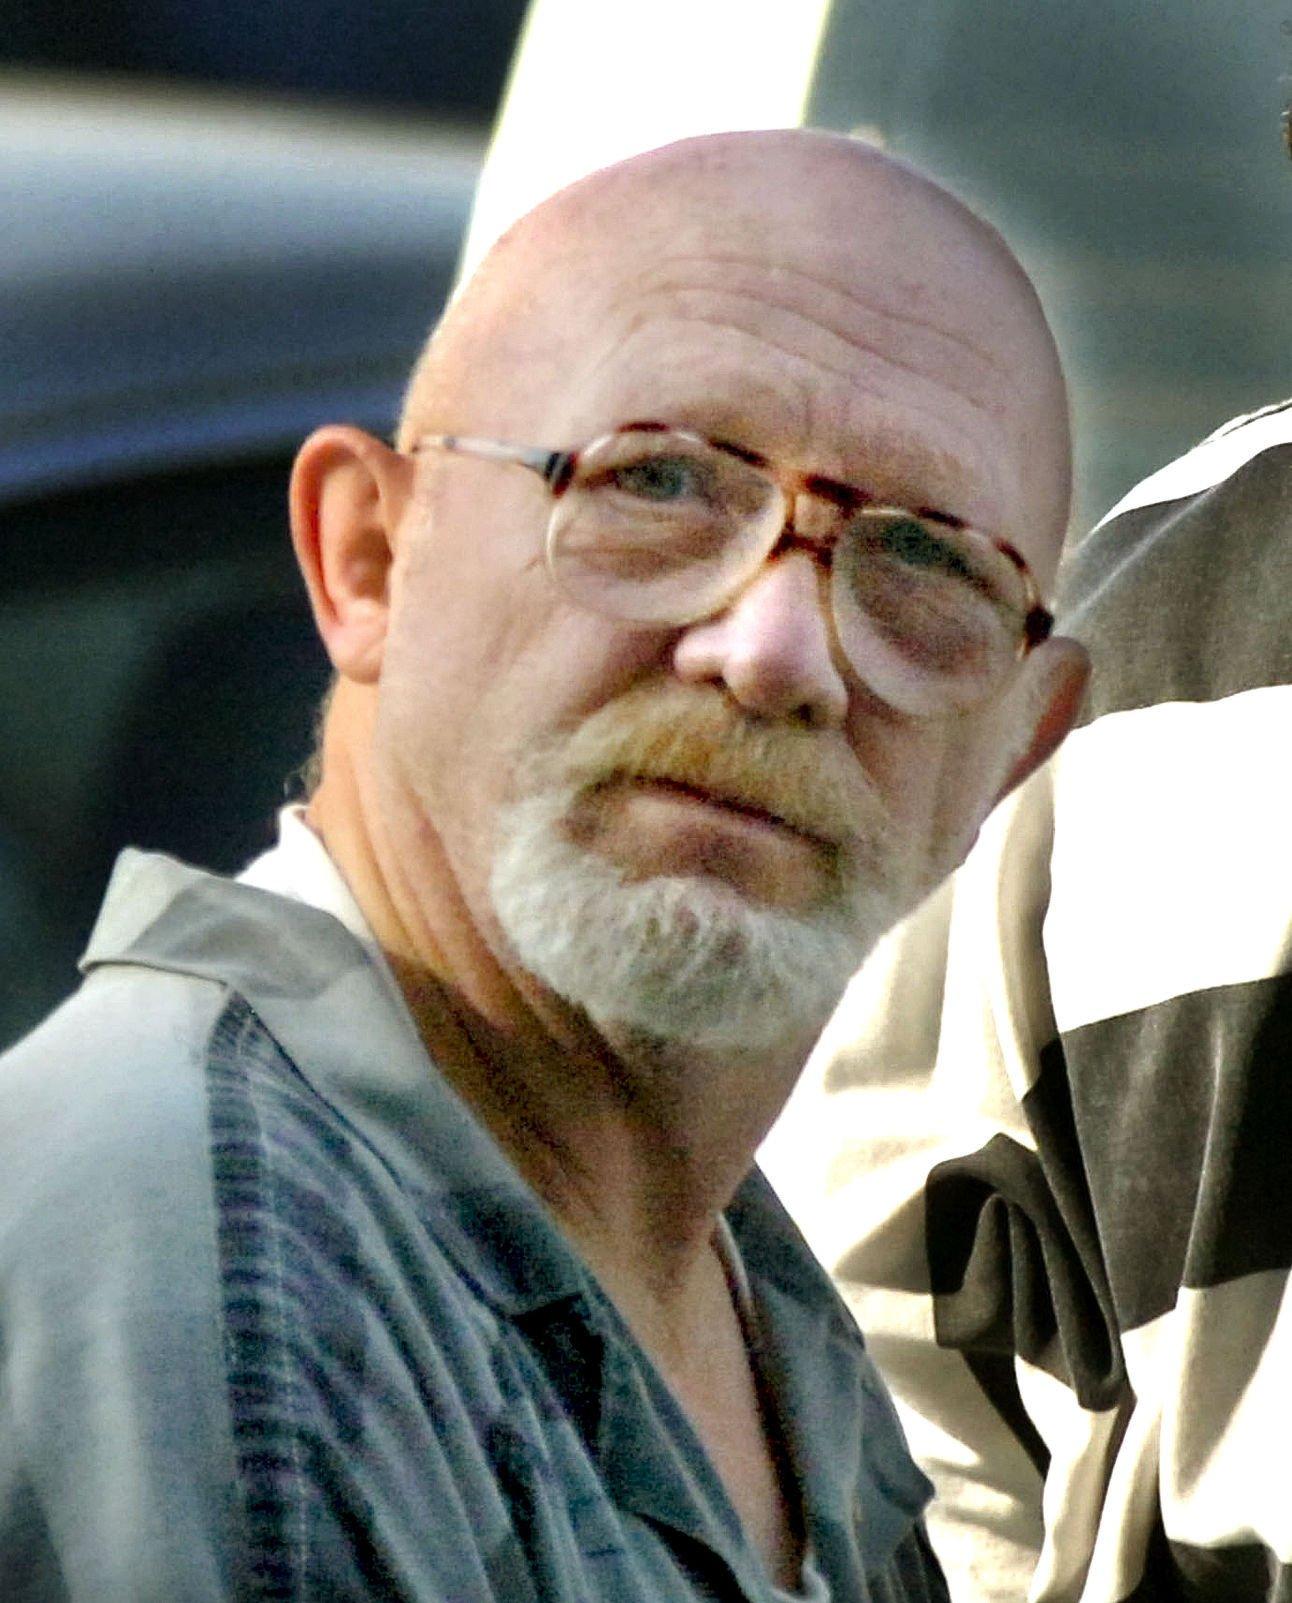 criminal background check on justin paul hatfield